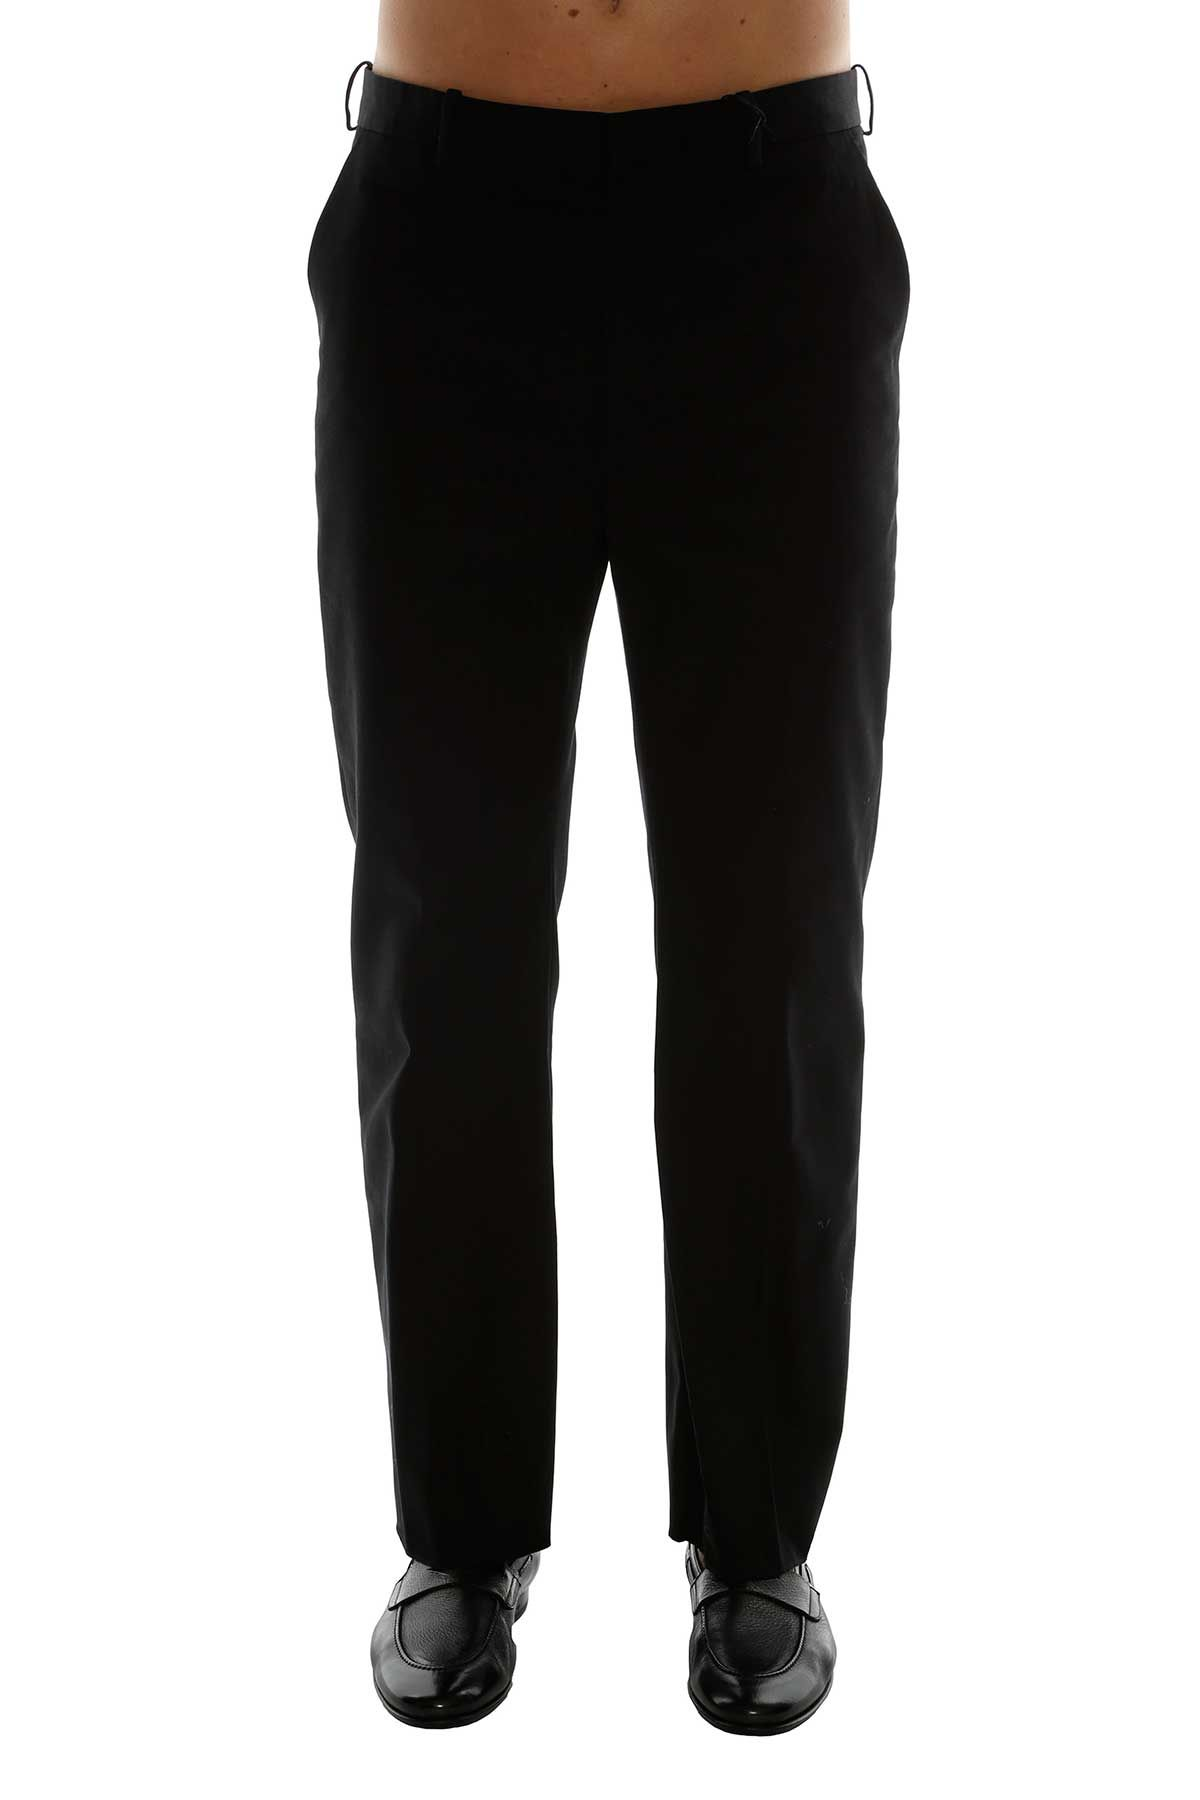 Balenciaga Casual Cropped Trousers